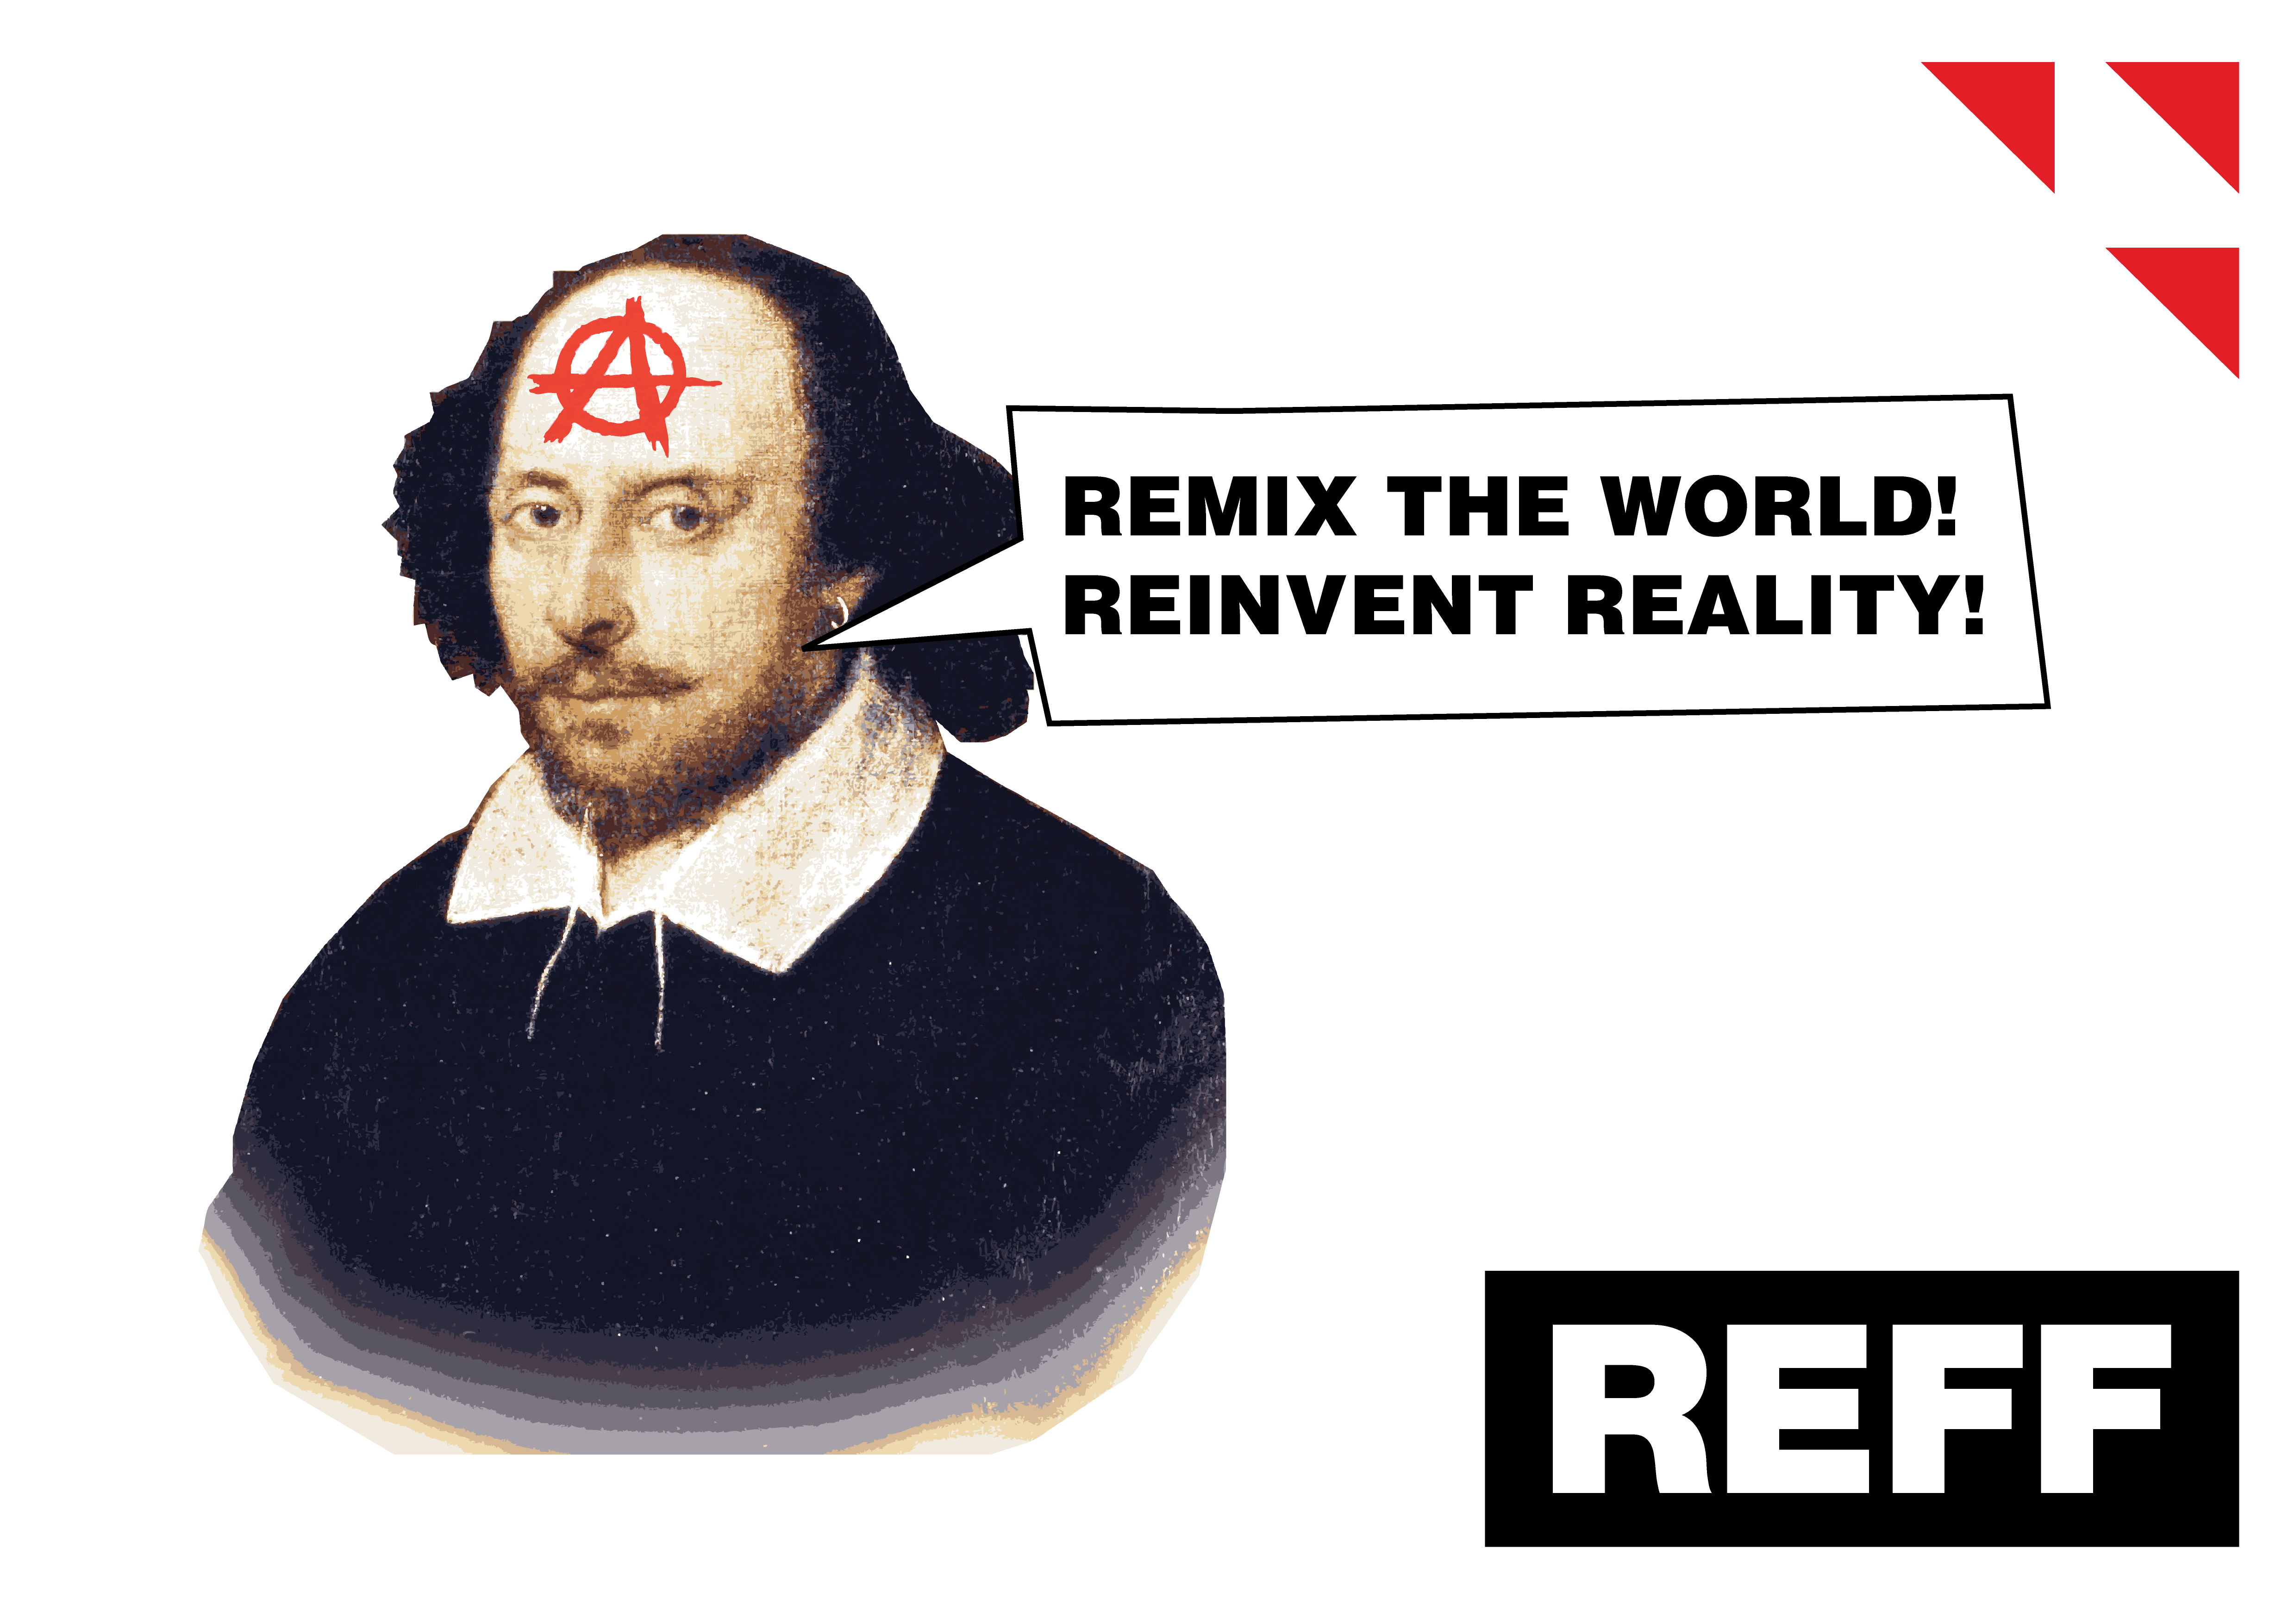 REFF Reinvent the World, Remix Reality